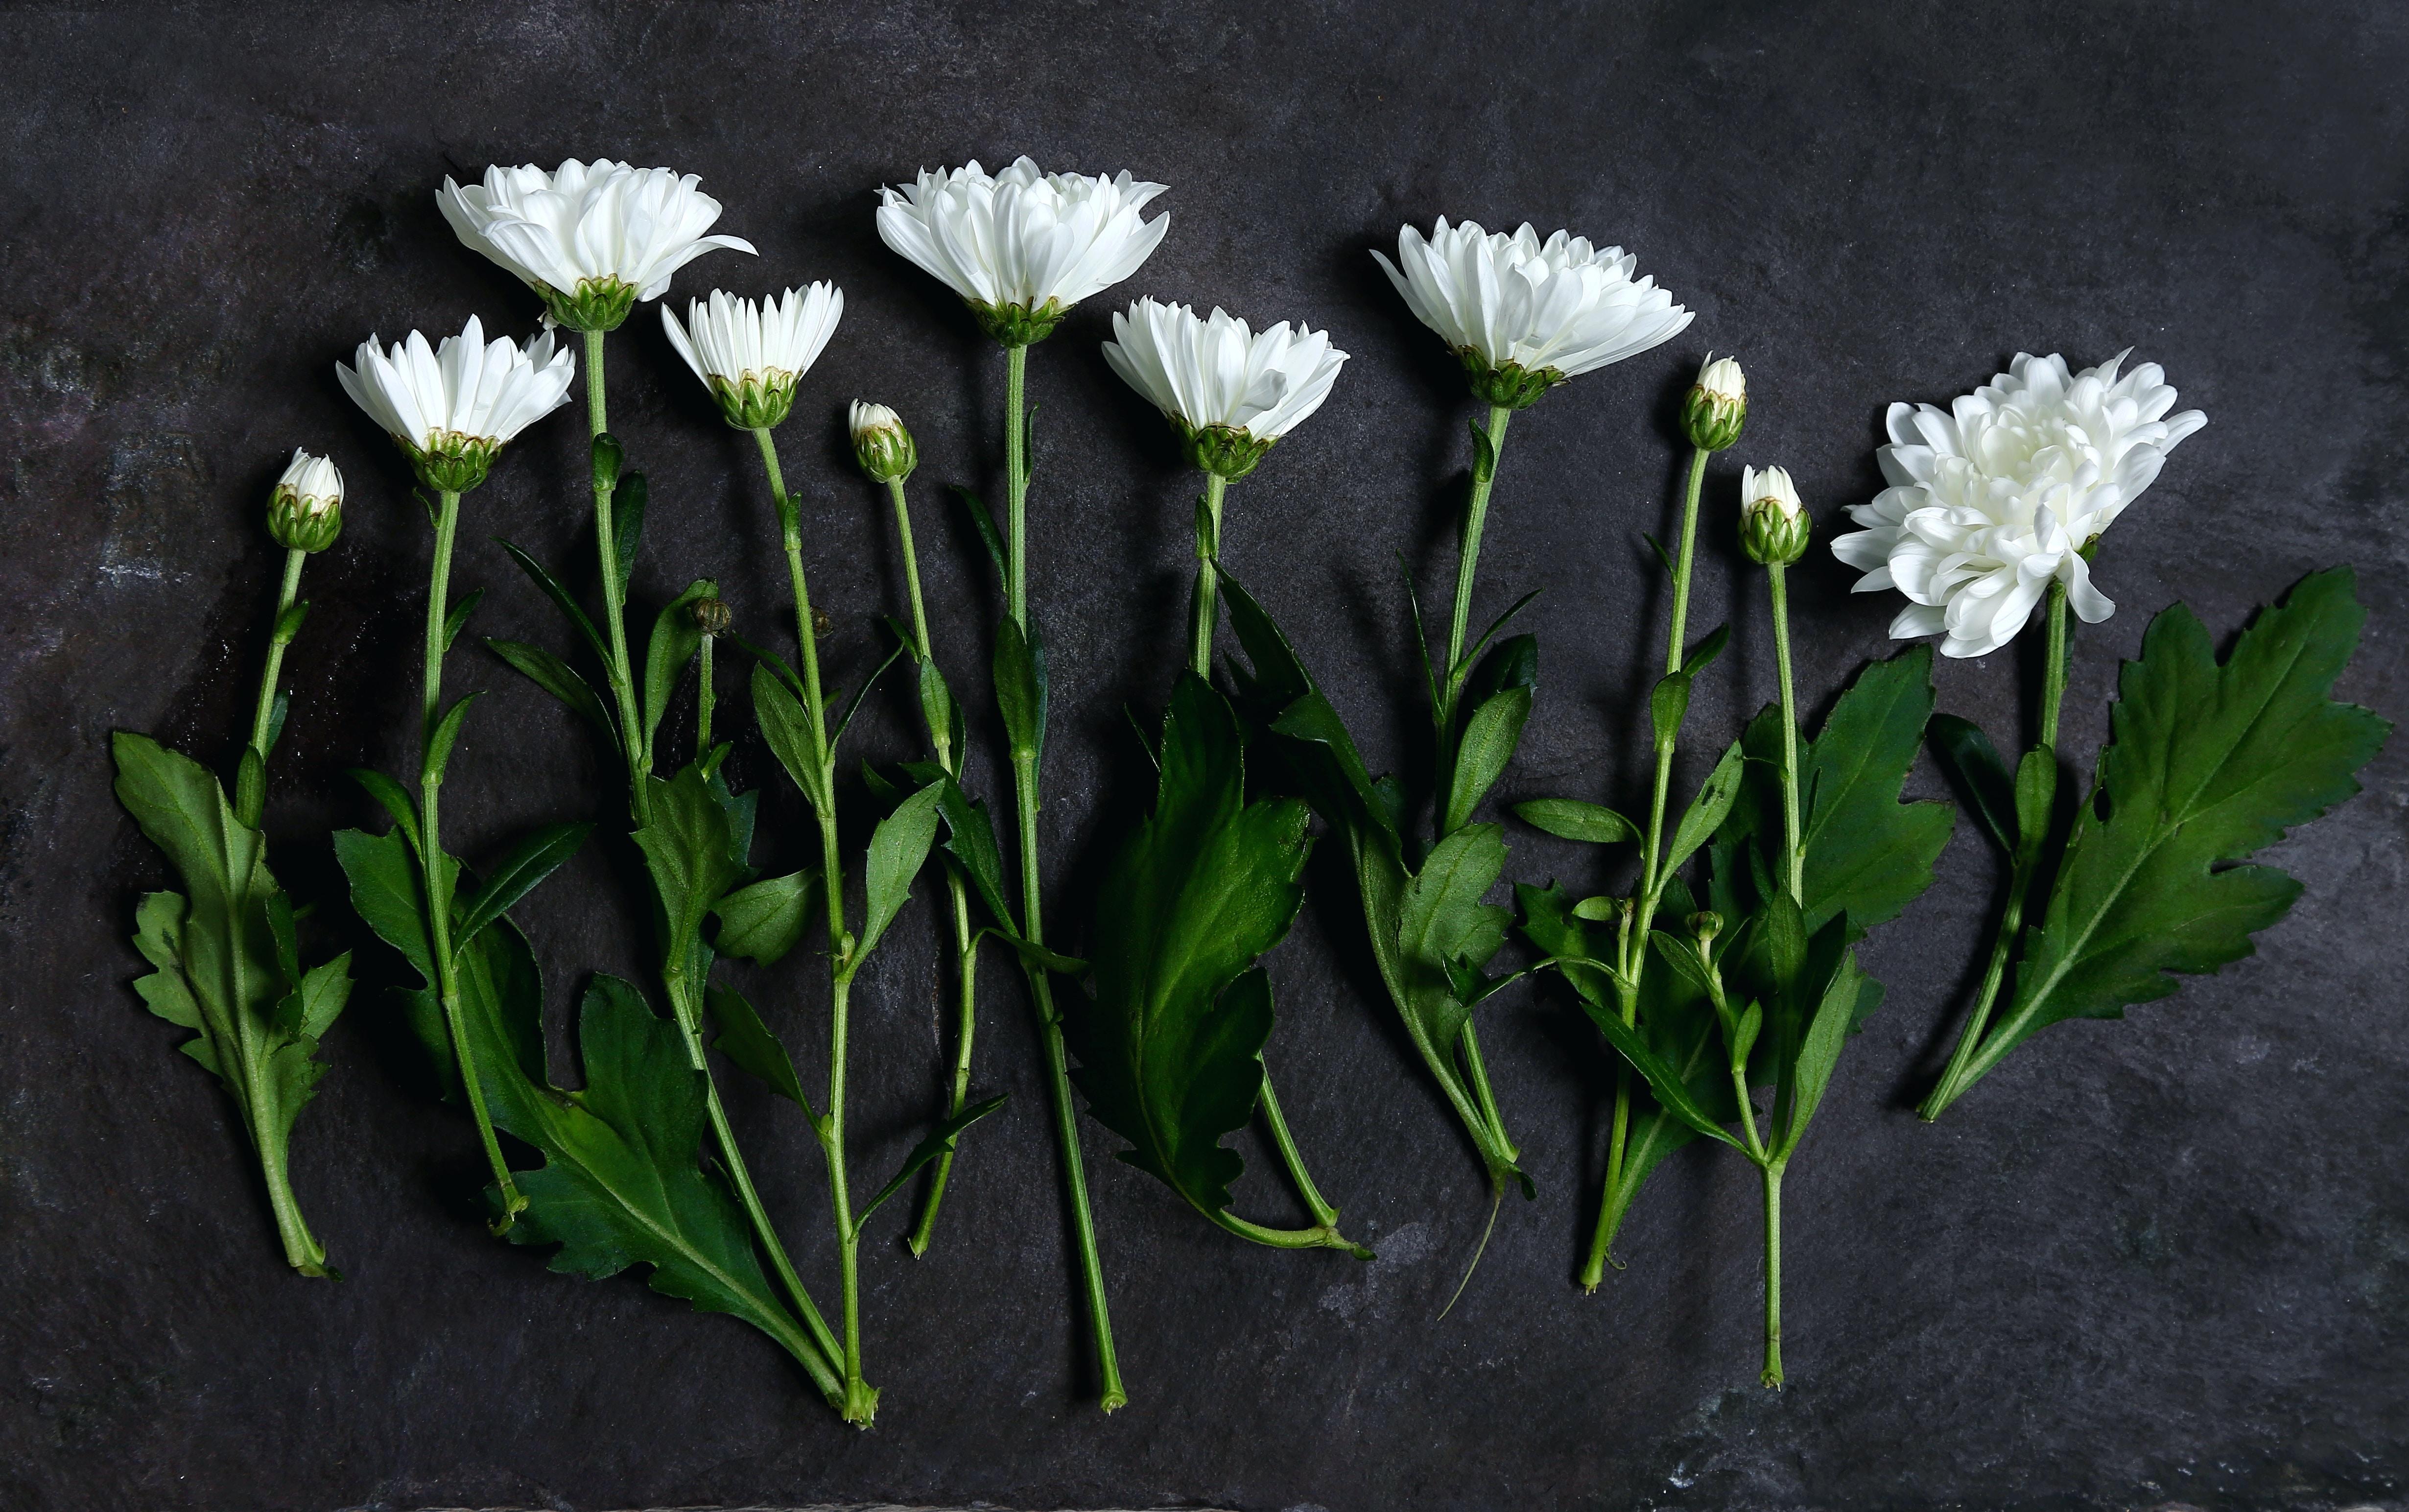 An overhead shot of white chrysanthemum flowers on a dark surface